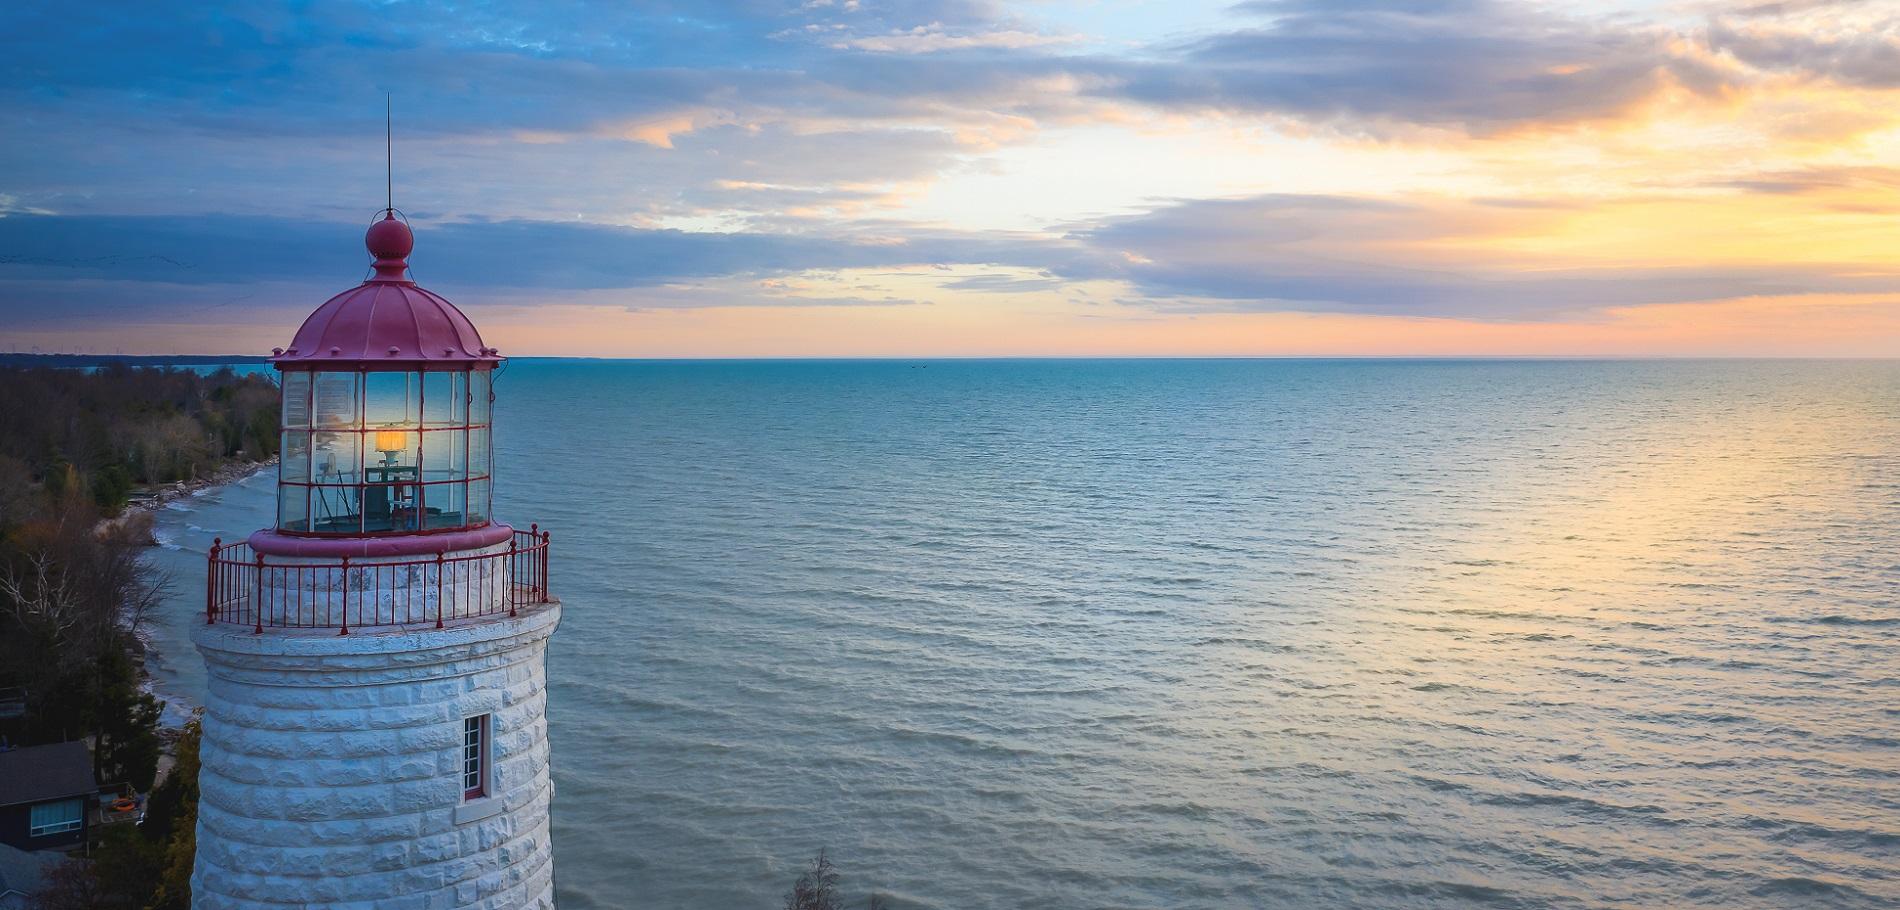 Point Clark Lighthouse at sunset